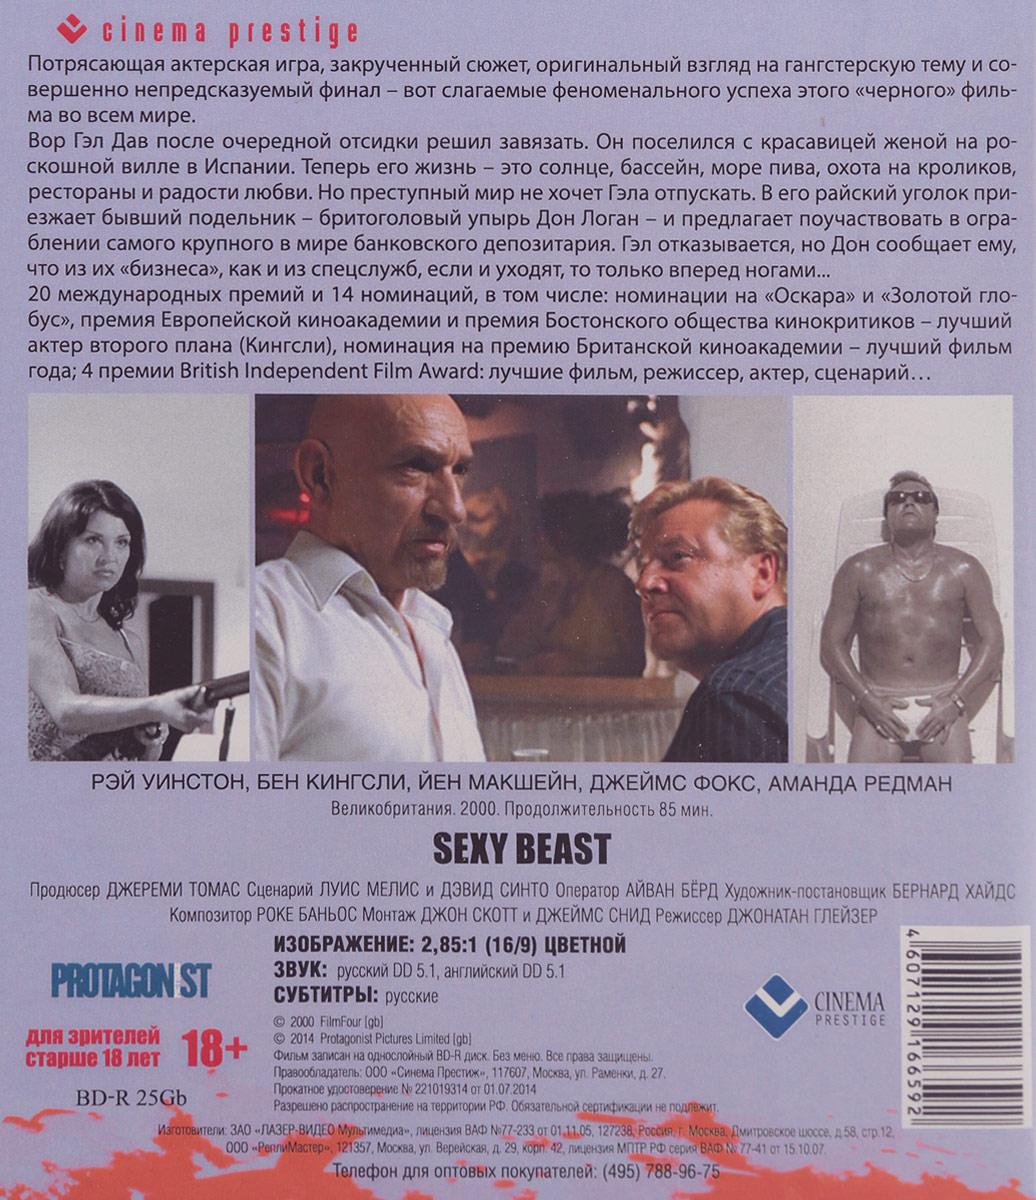 Сексуальная тварь (Blu-Ray) FilmFour,Protagonist Pictures